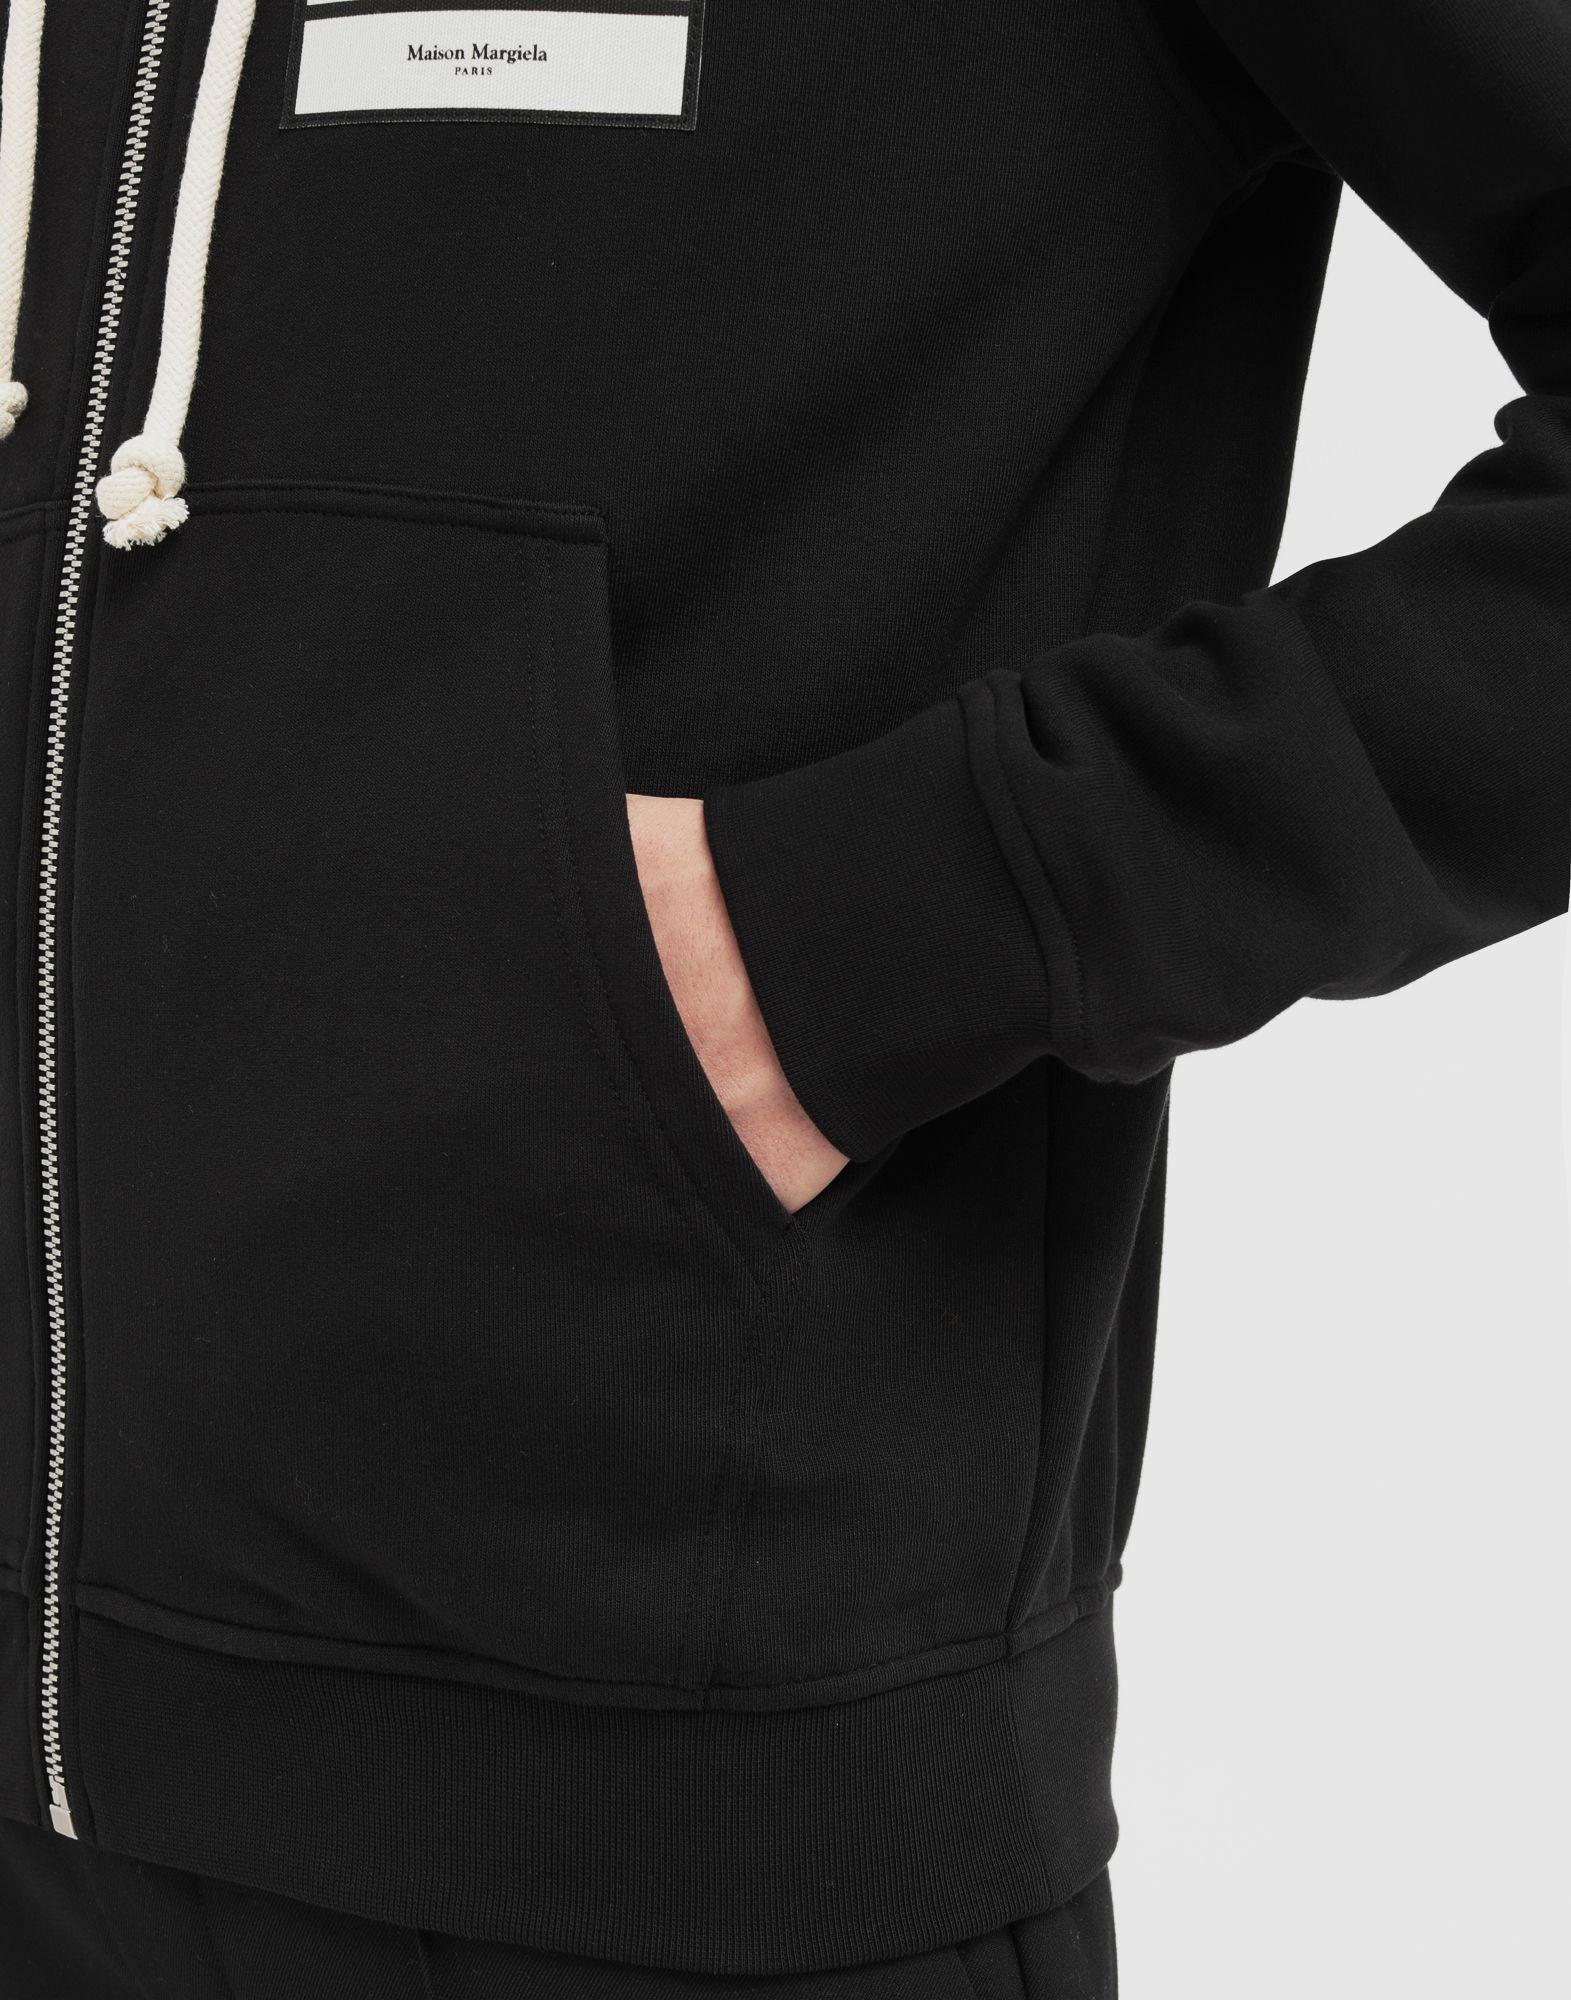 MAISON MARGIELA Stereotype hooded sweatshirt Sweatshirt Man b